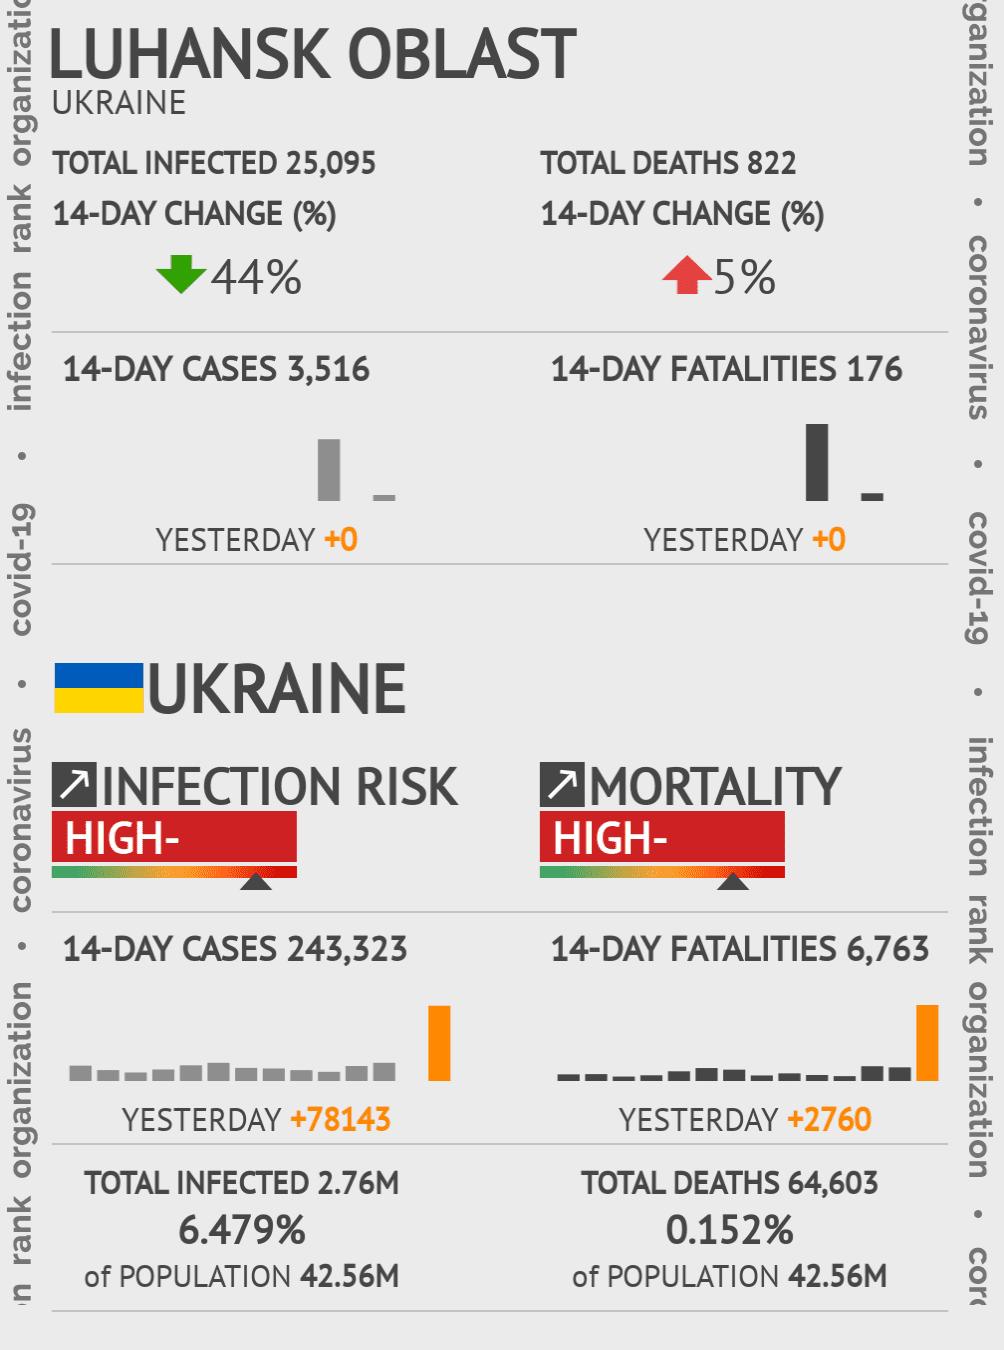 Luhansk Oblast Coronavirus Covid-19 Risk of Infection on March 03, 2021